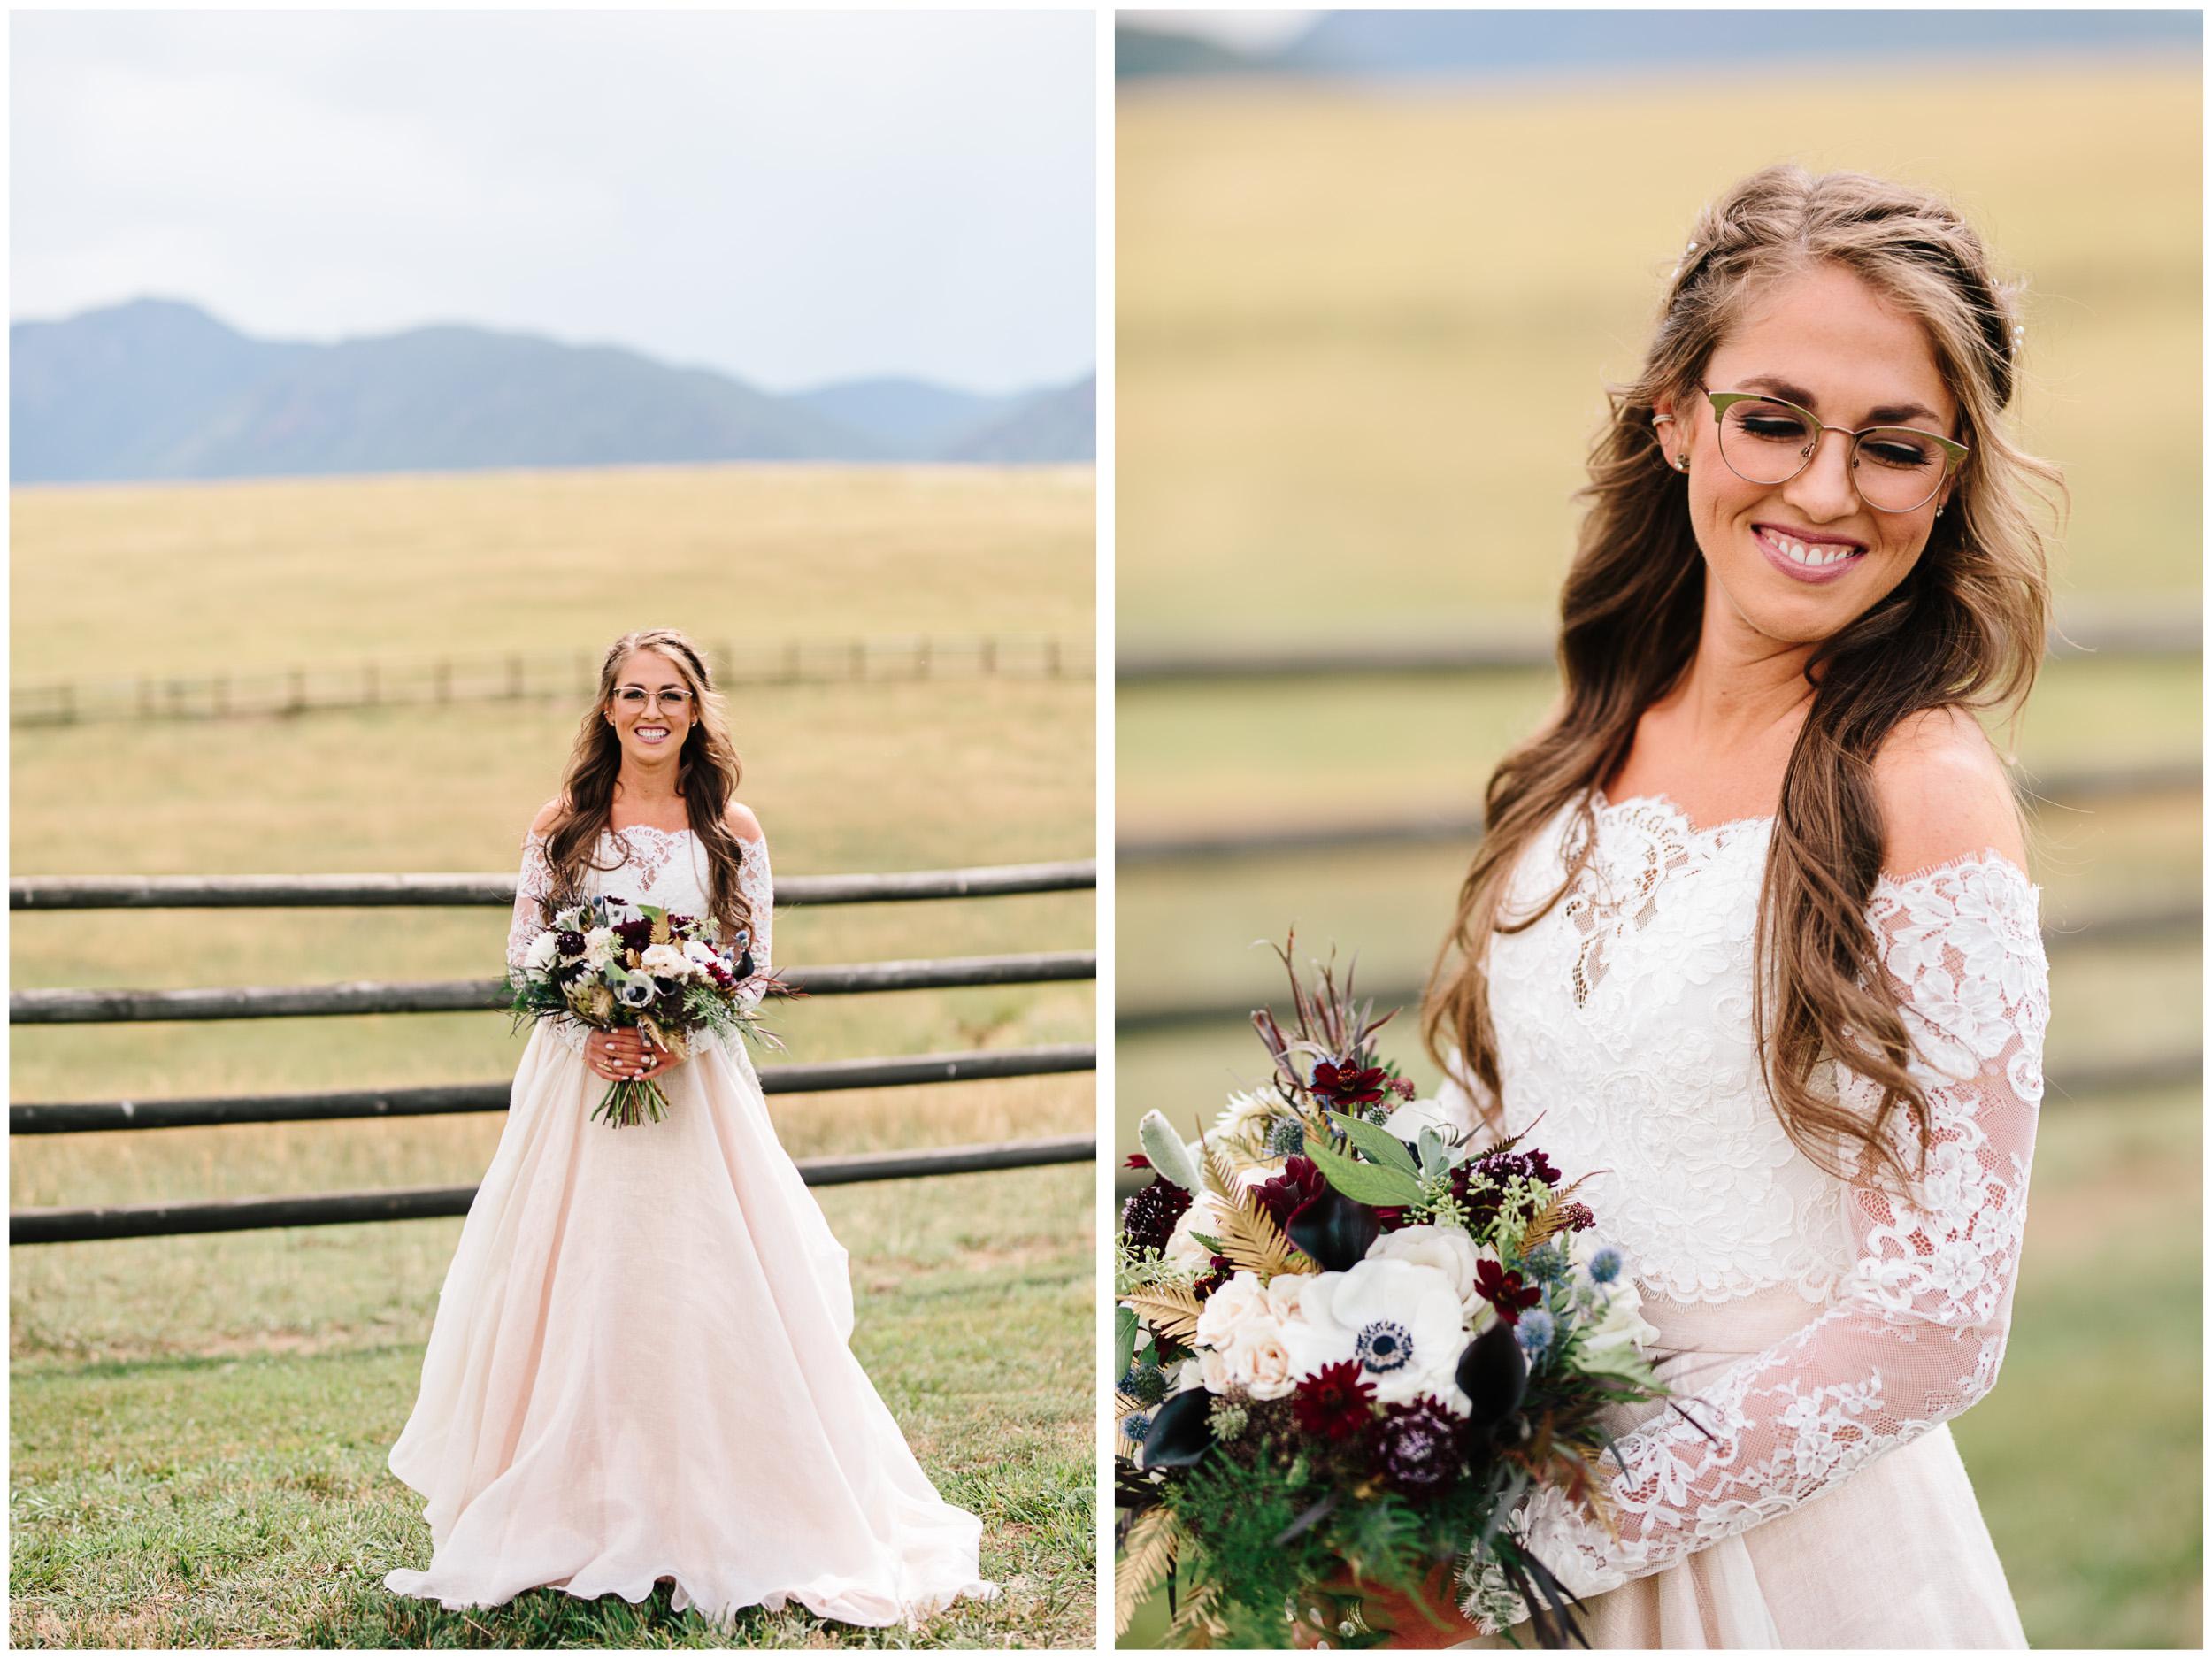 spruce_mountain_ranch_wedding_28.jpg